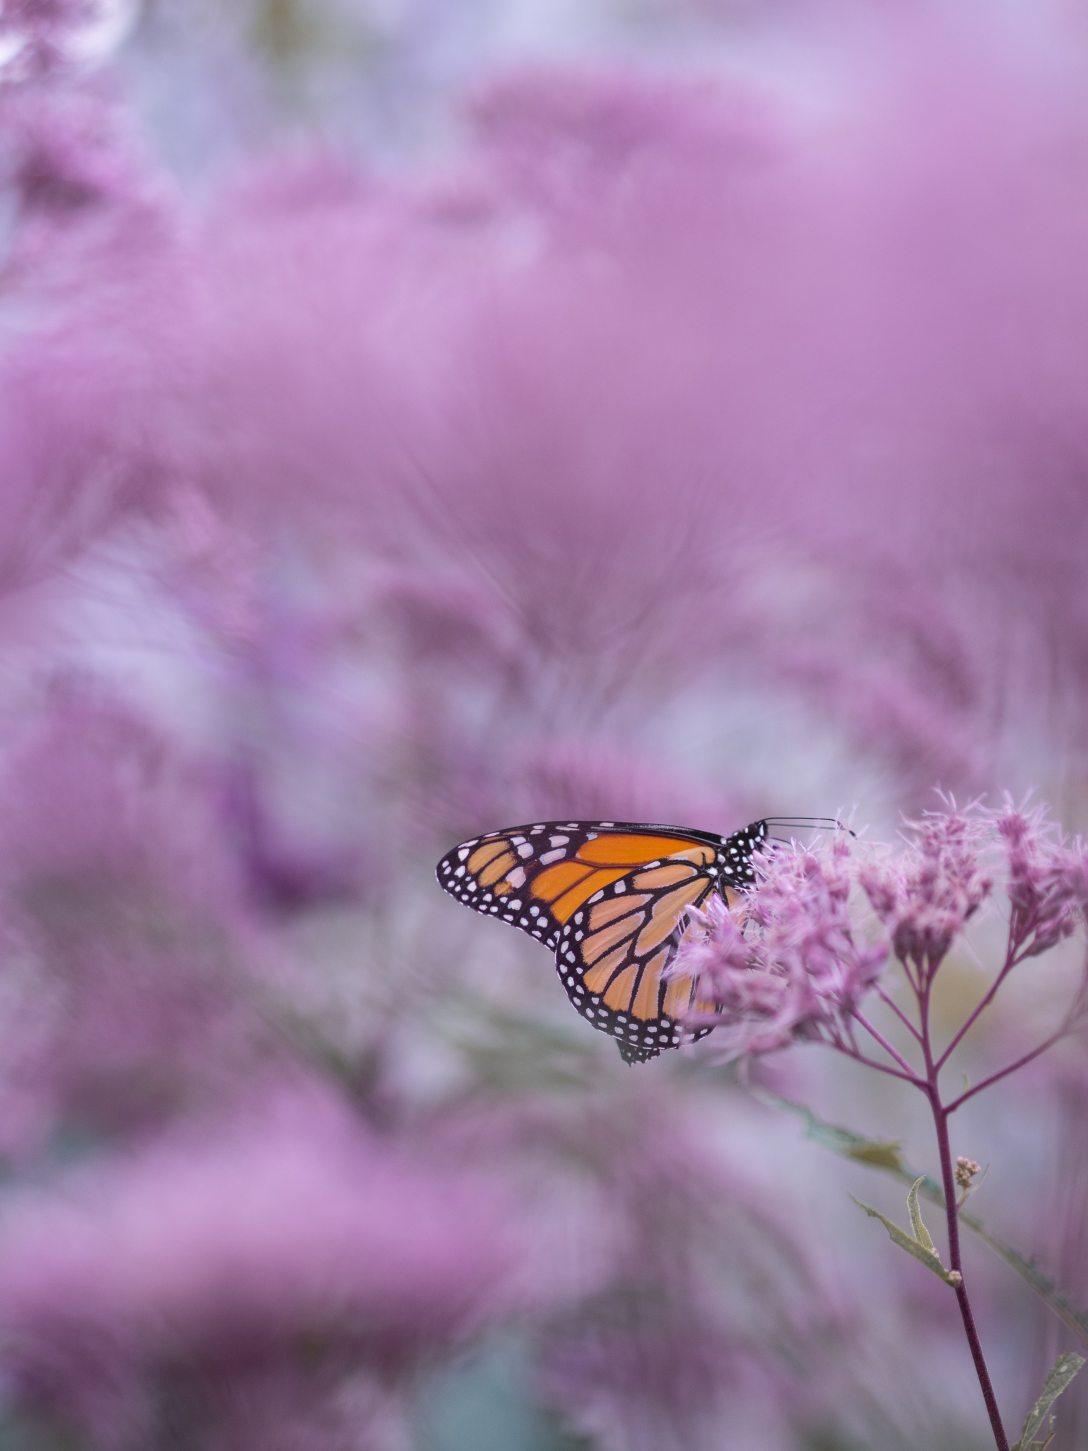 Photo of monarch butterfly with purple flowers by Aaron Burden on Unsplash